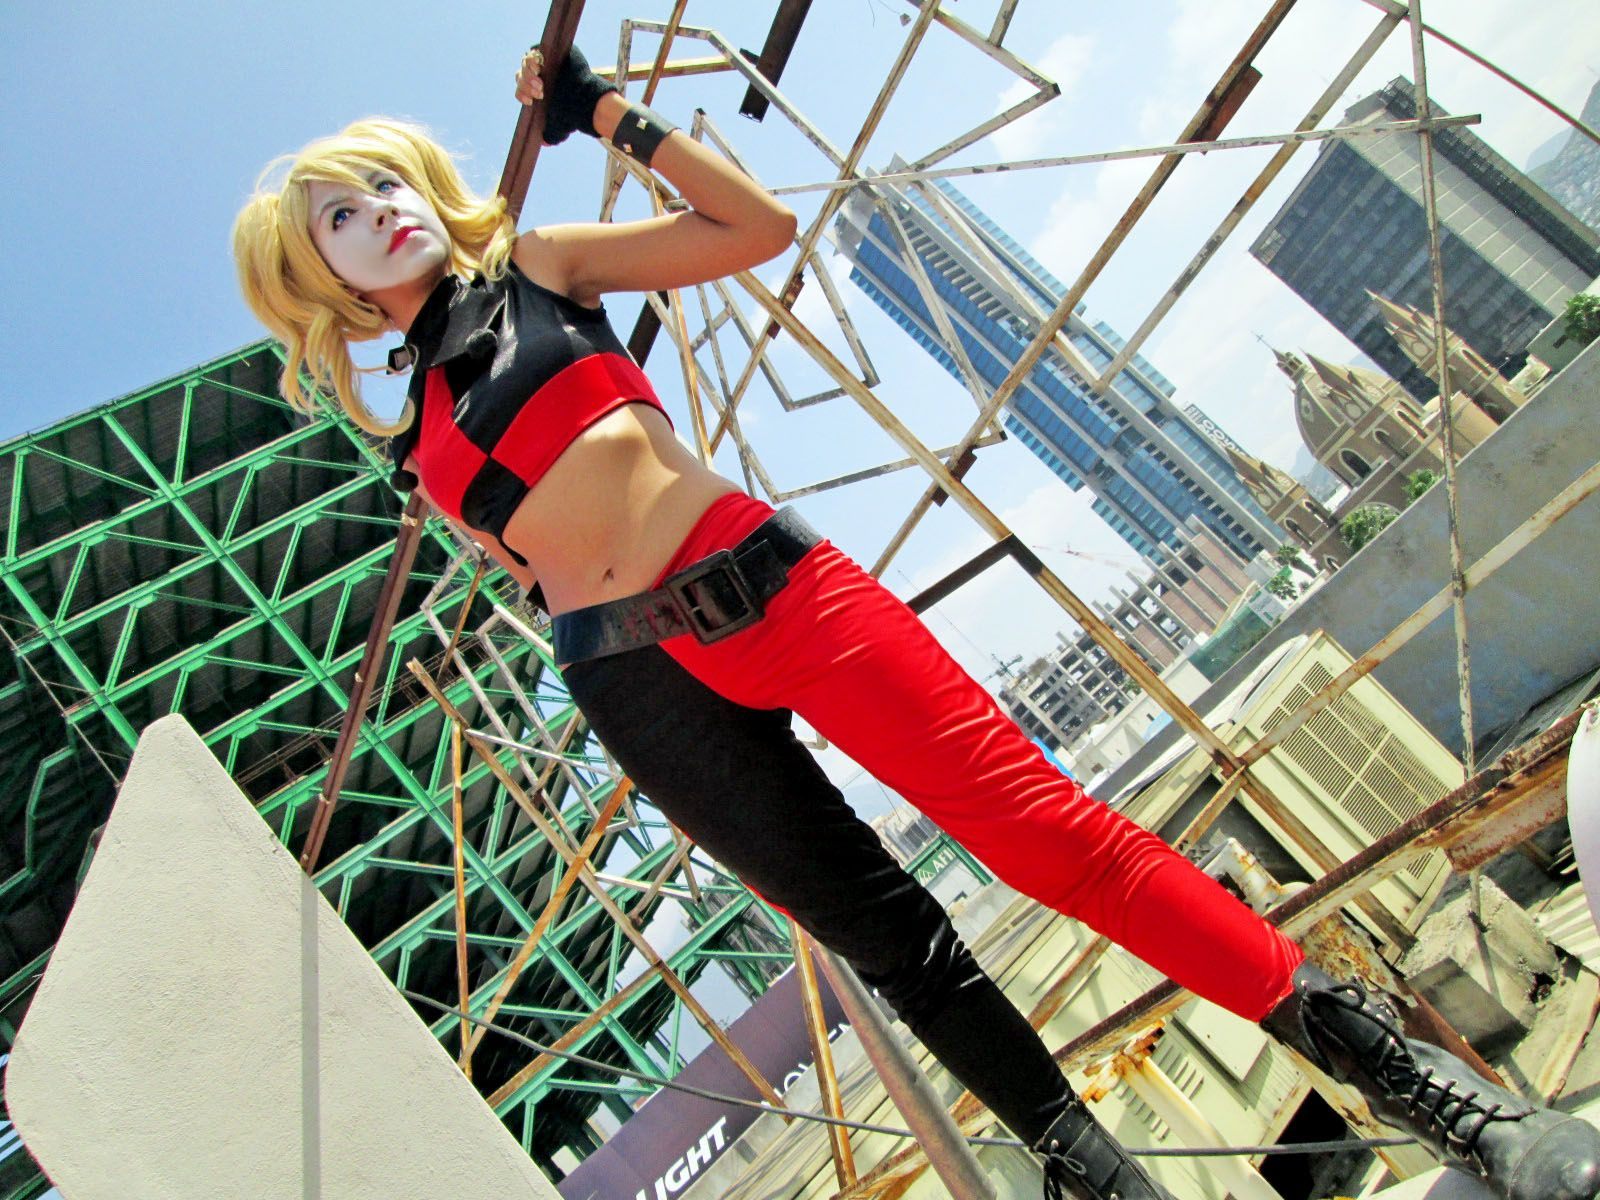 Harley Quinn - Assault on Arkham Cosplay